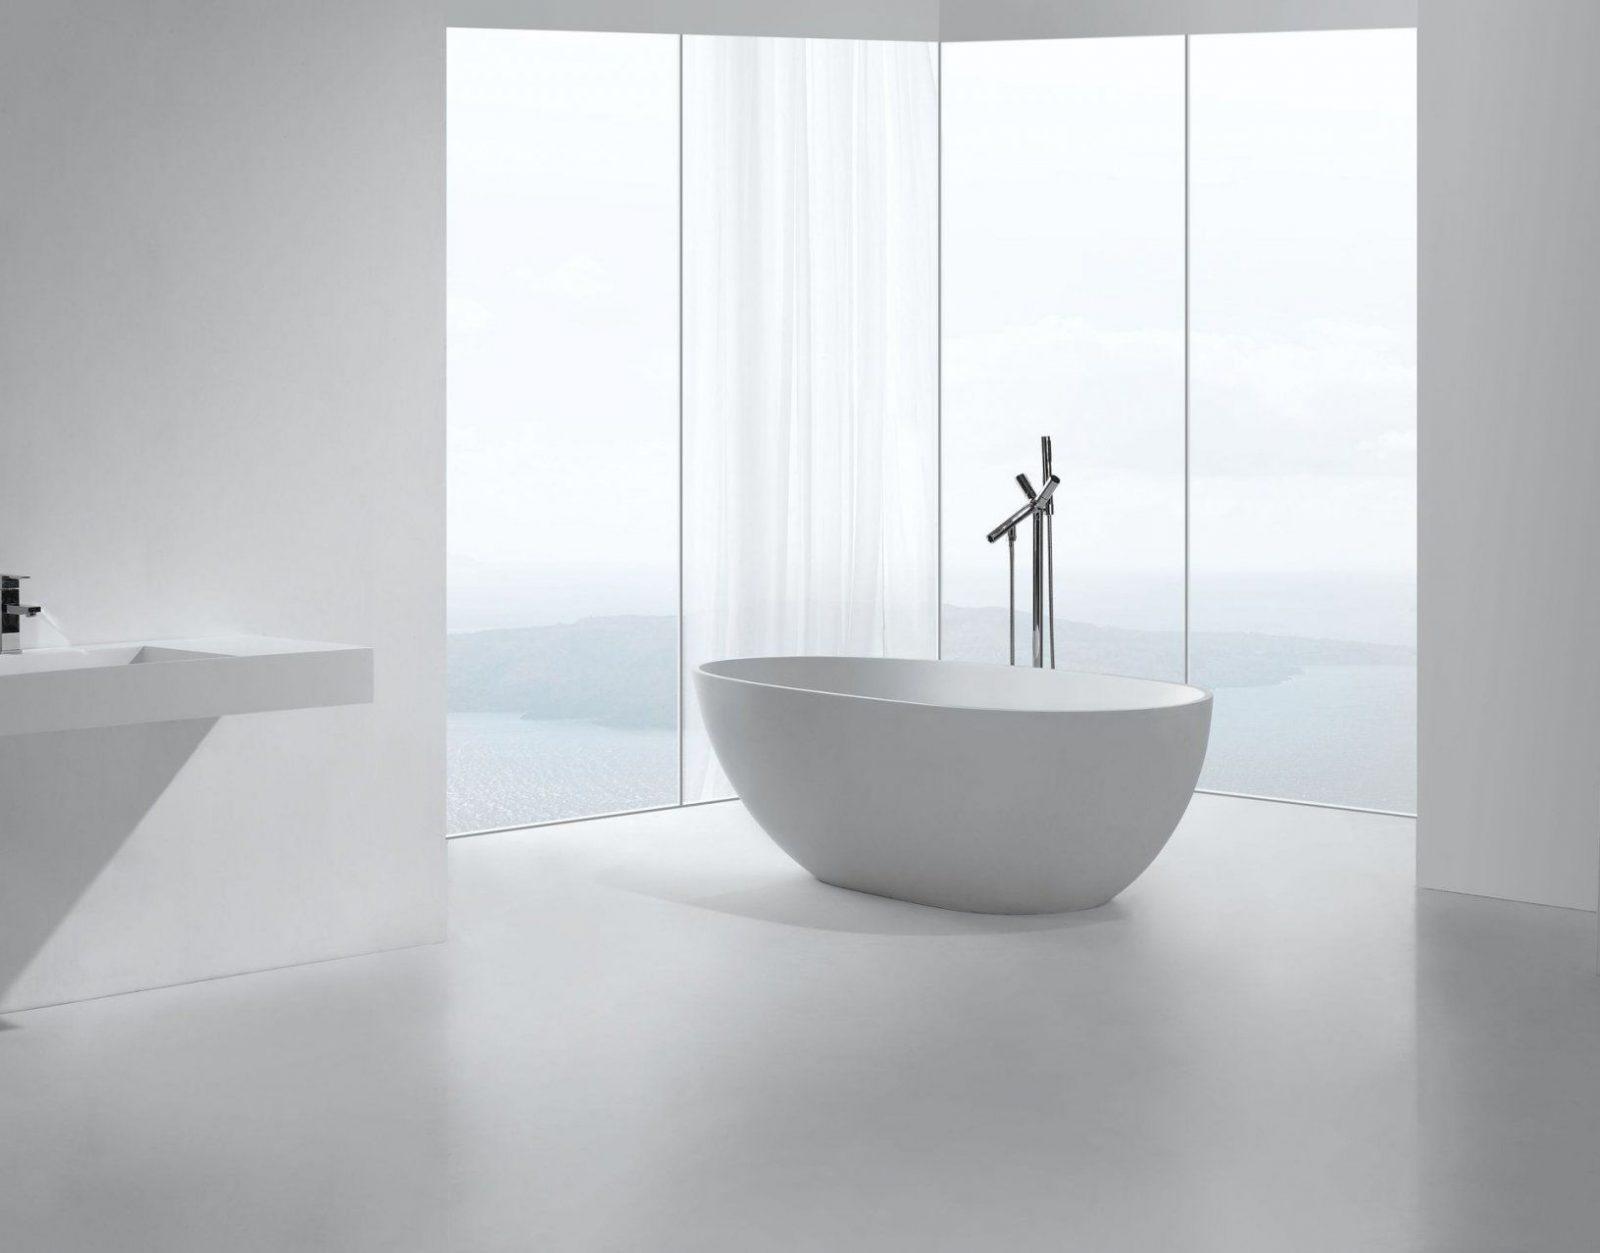 Atemberaubend Freistehende Badewanne Mineralguss Oder Acryl Grafffit von Freistehende Badewanne Mineralguss Oder Acryl Photo